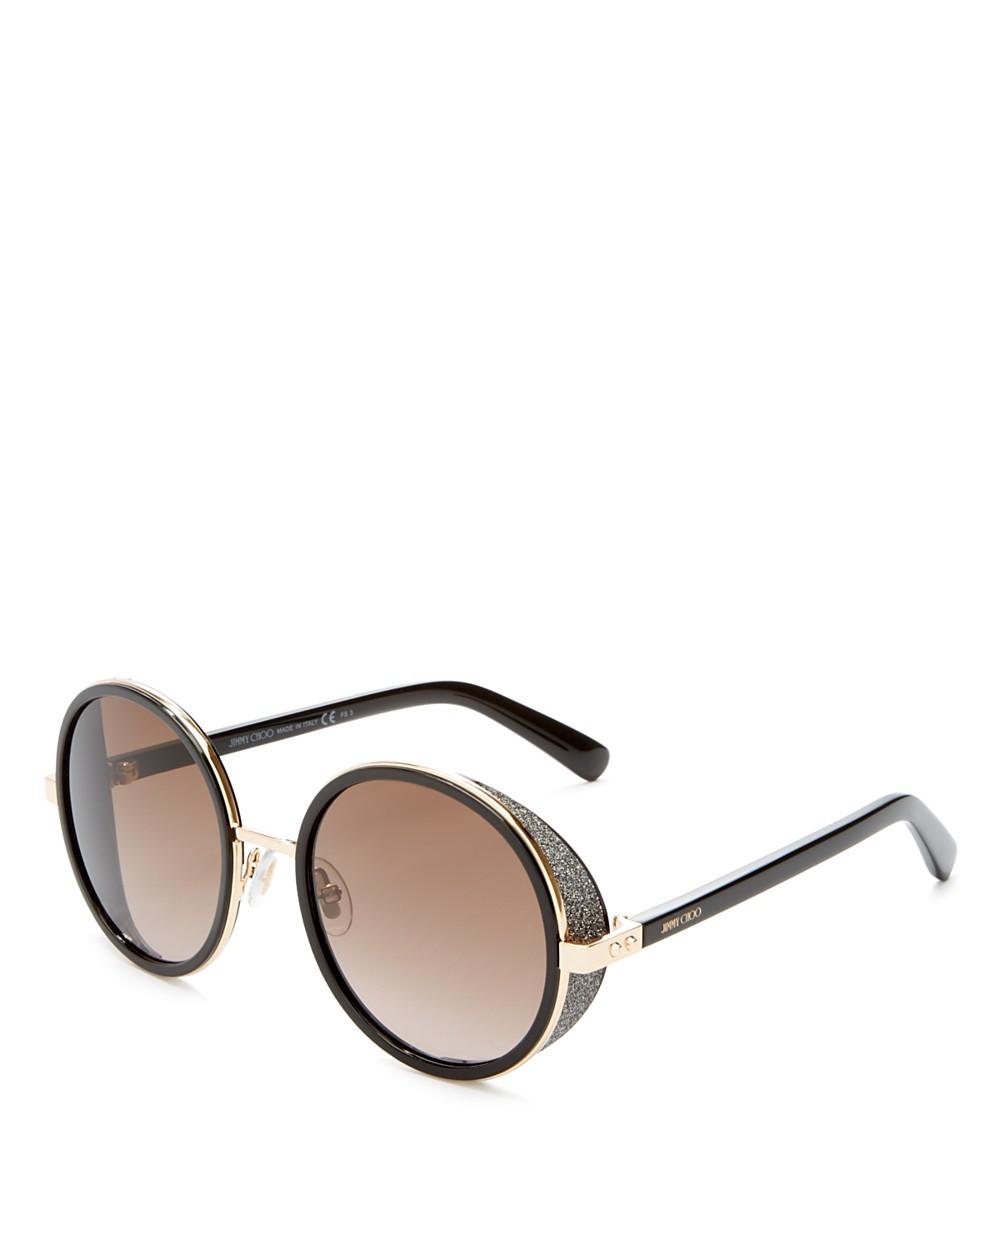 JIMMY CHOO Andie Havana Brown Acetate Round Framed Sunglasses With ...